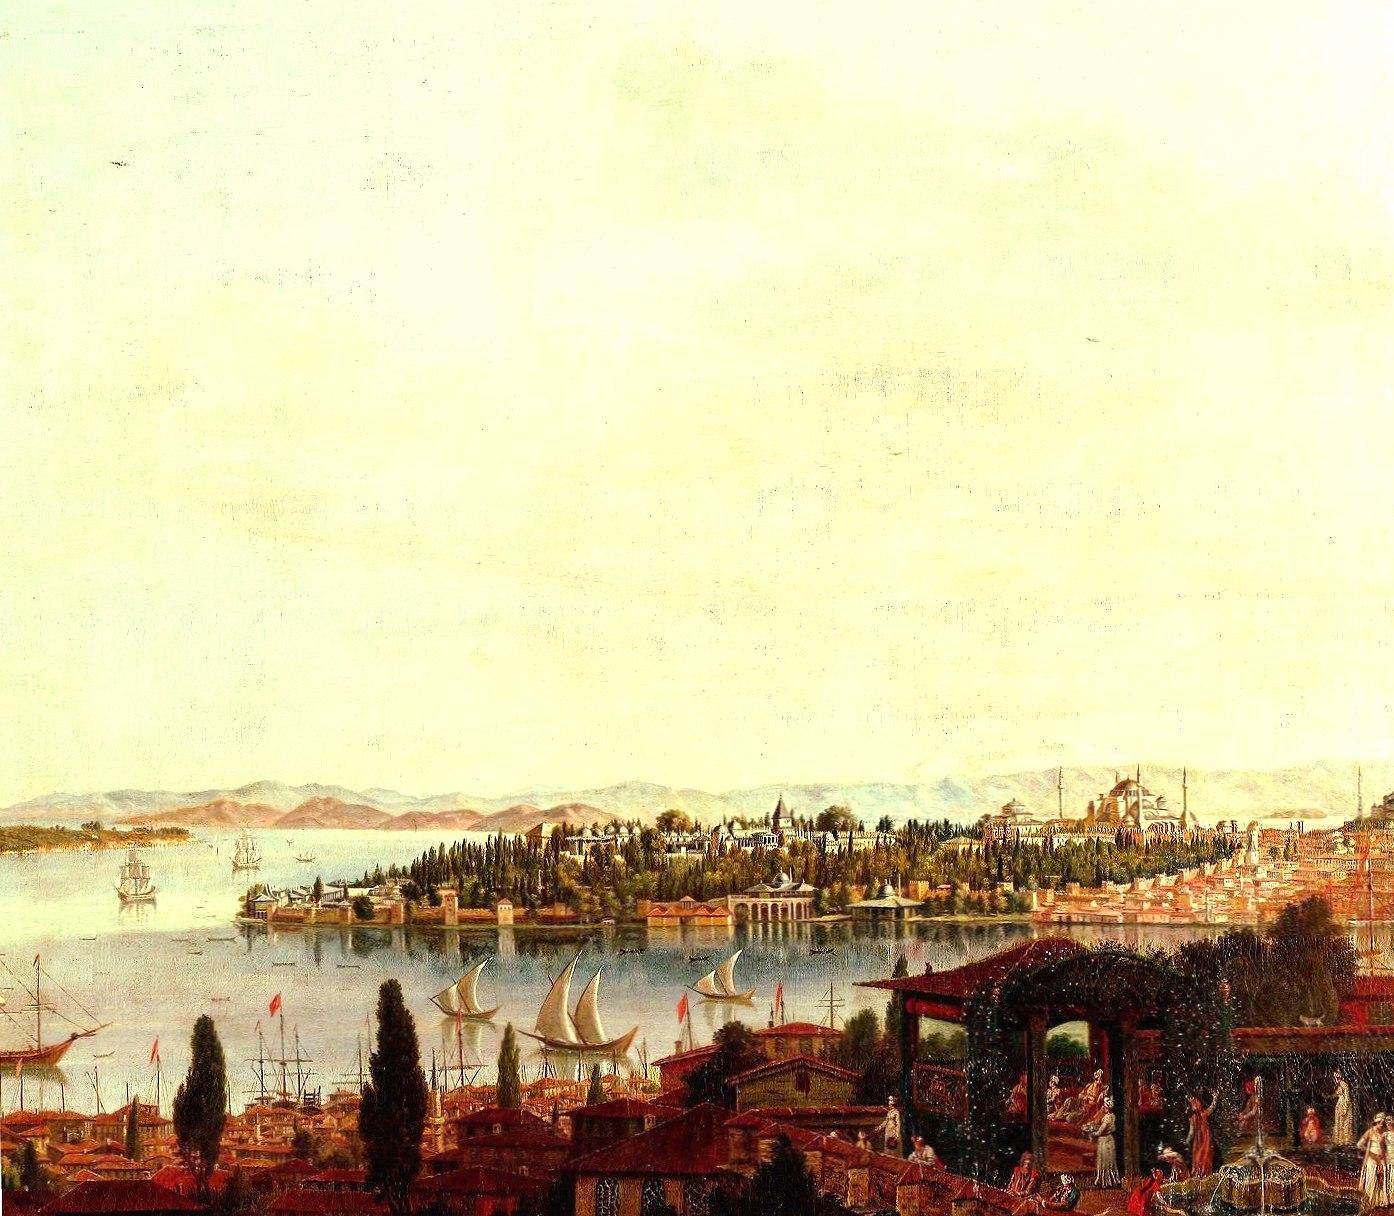 eski istanbul wallpapers HD quality